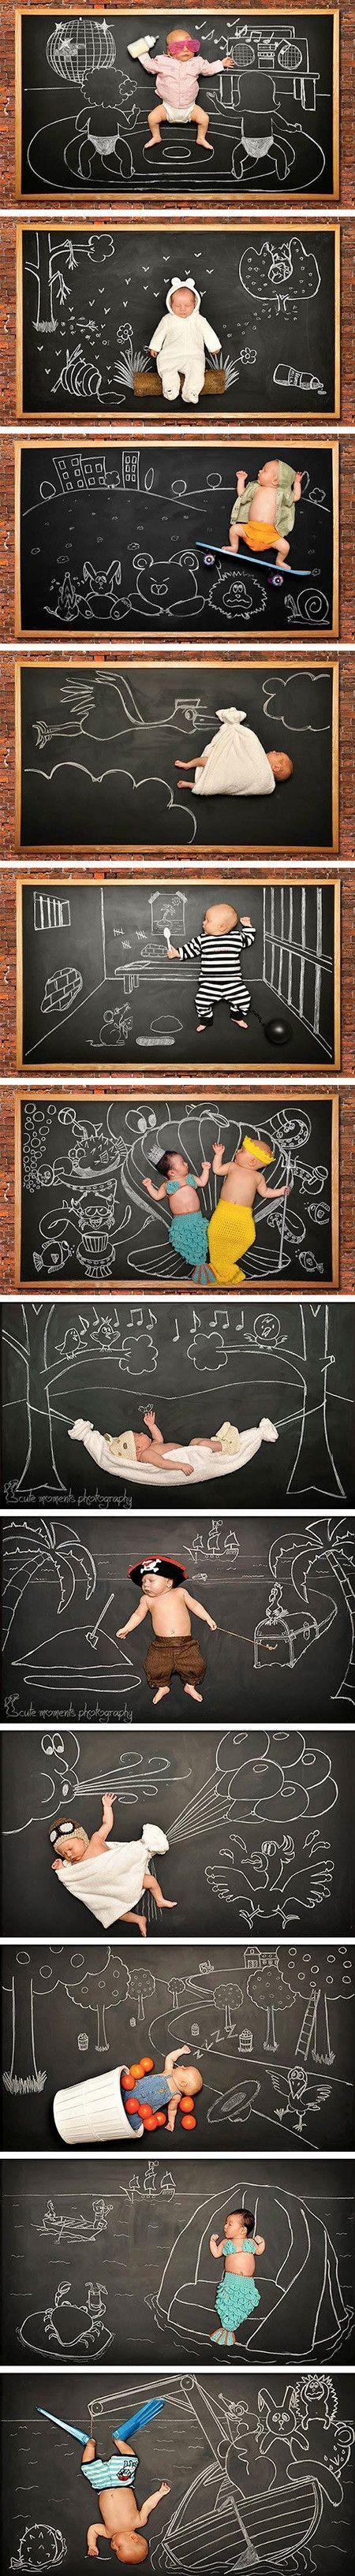 Photographer Wants Newborn Son to Think She's Cool, Blackboard Adventures Ensue - TechEBlog: